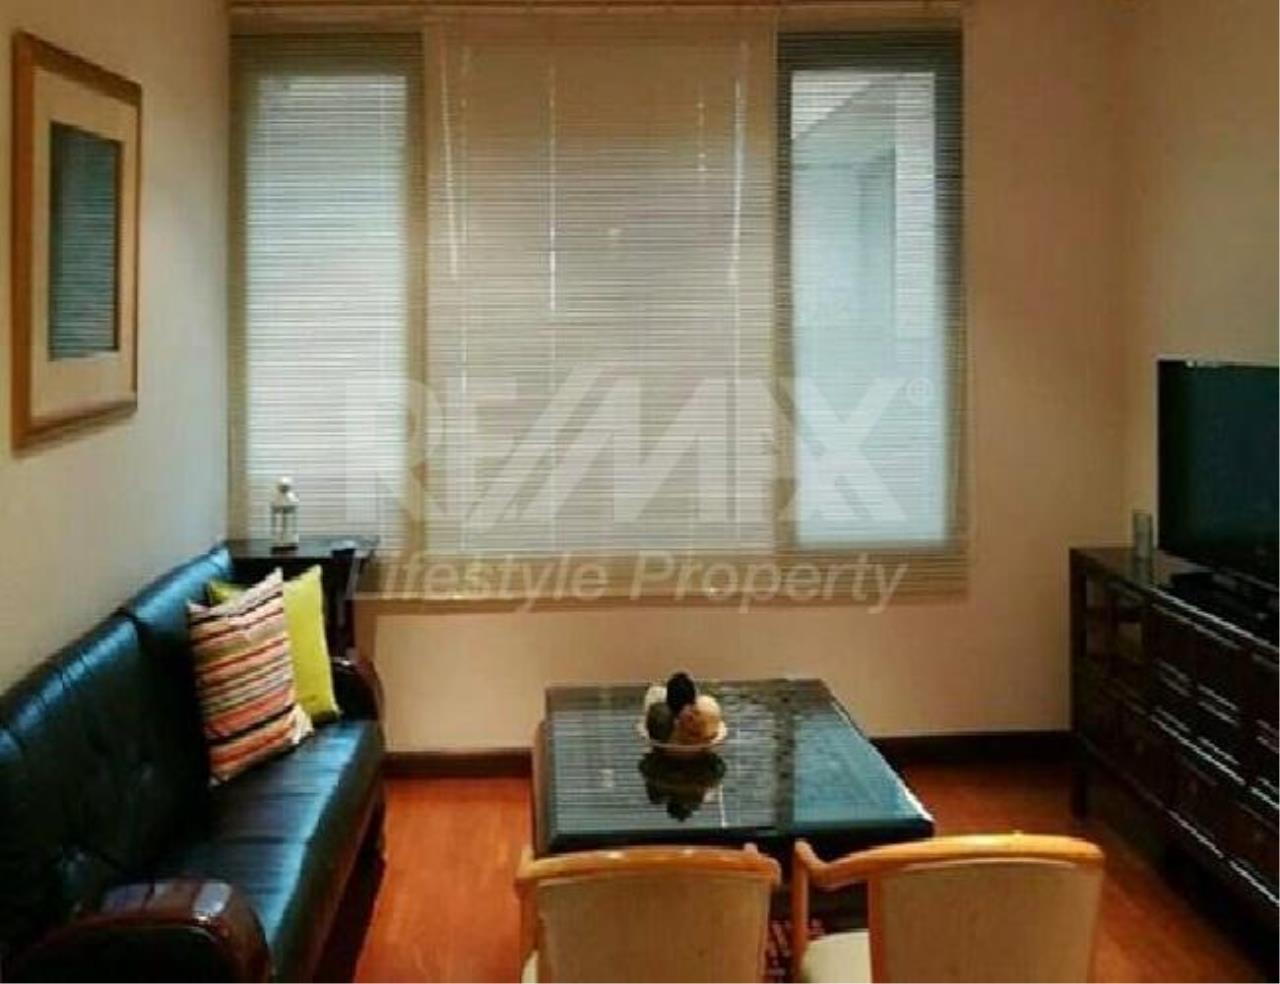 RE/MAX LifeStyle Property Agency's Baan Piya Sathorn 7